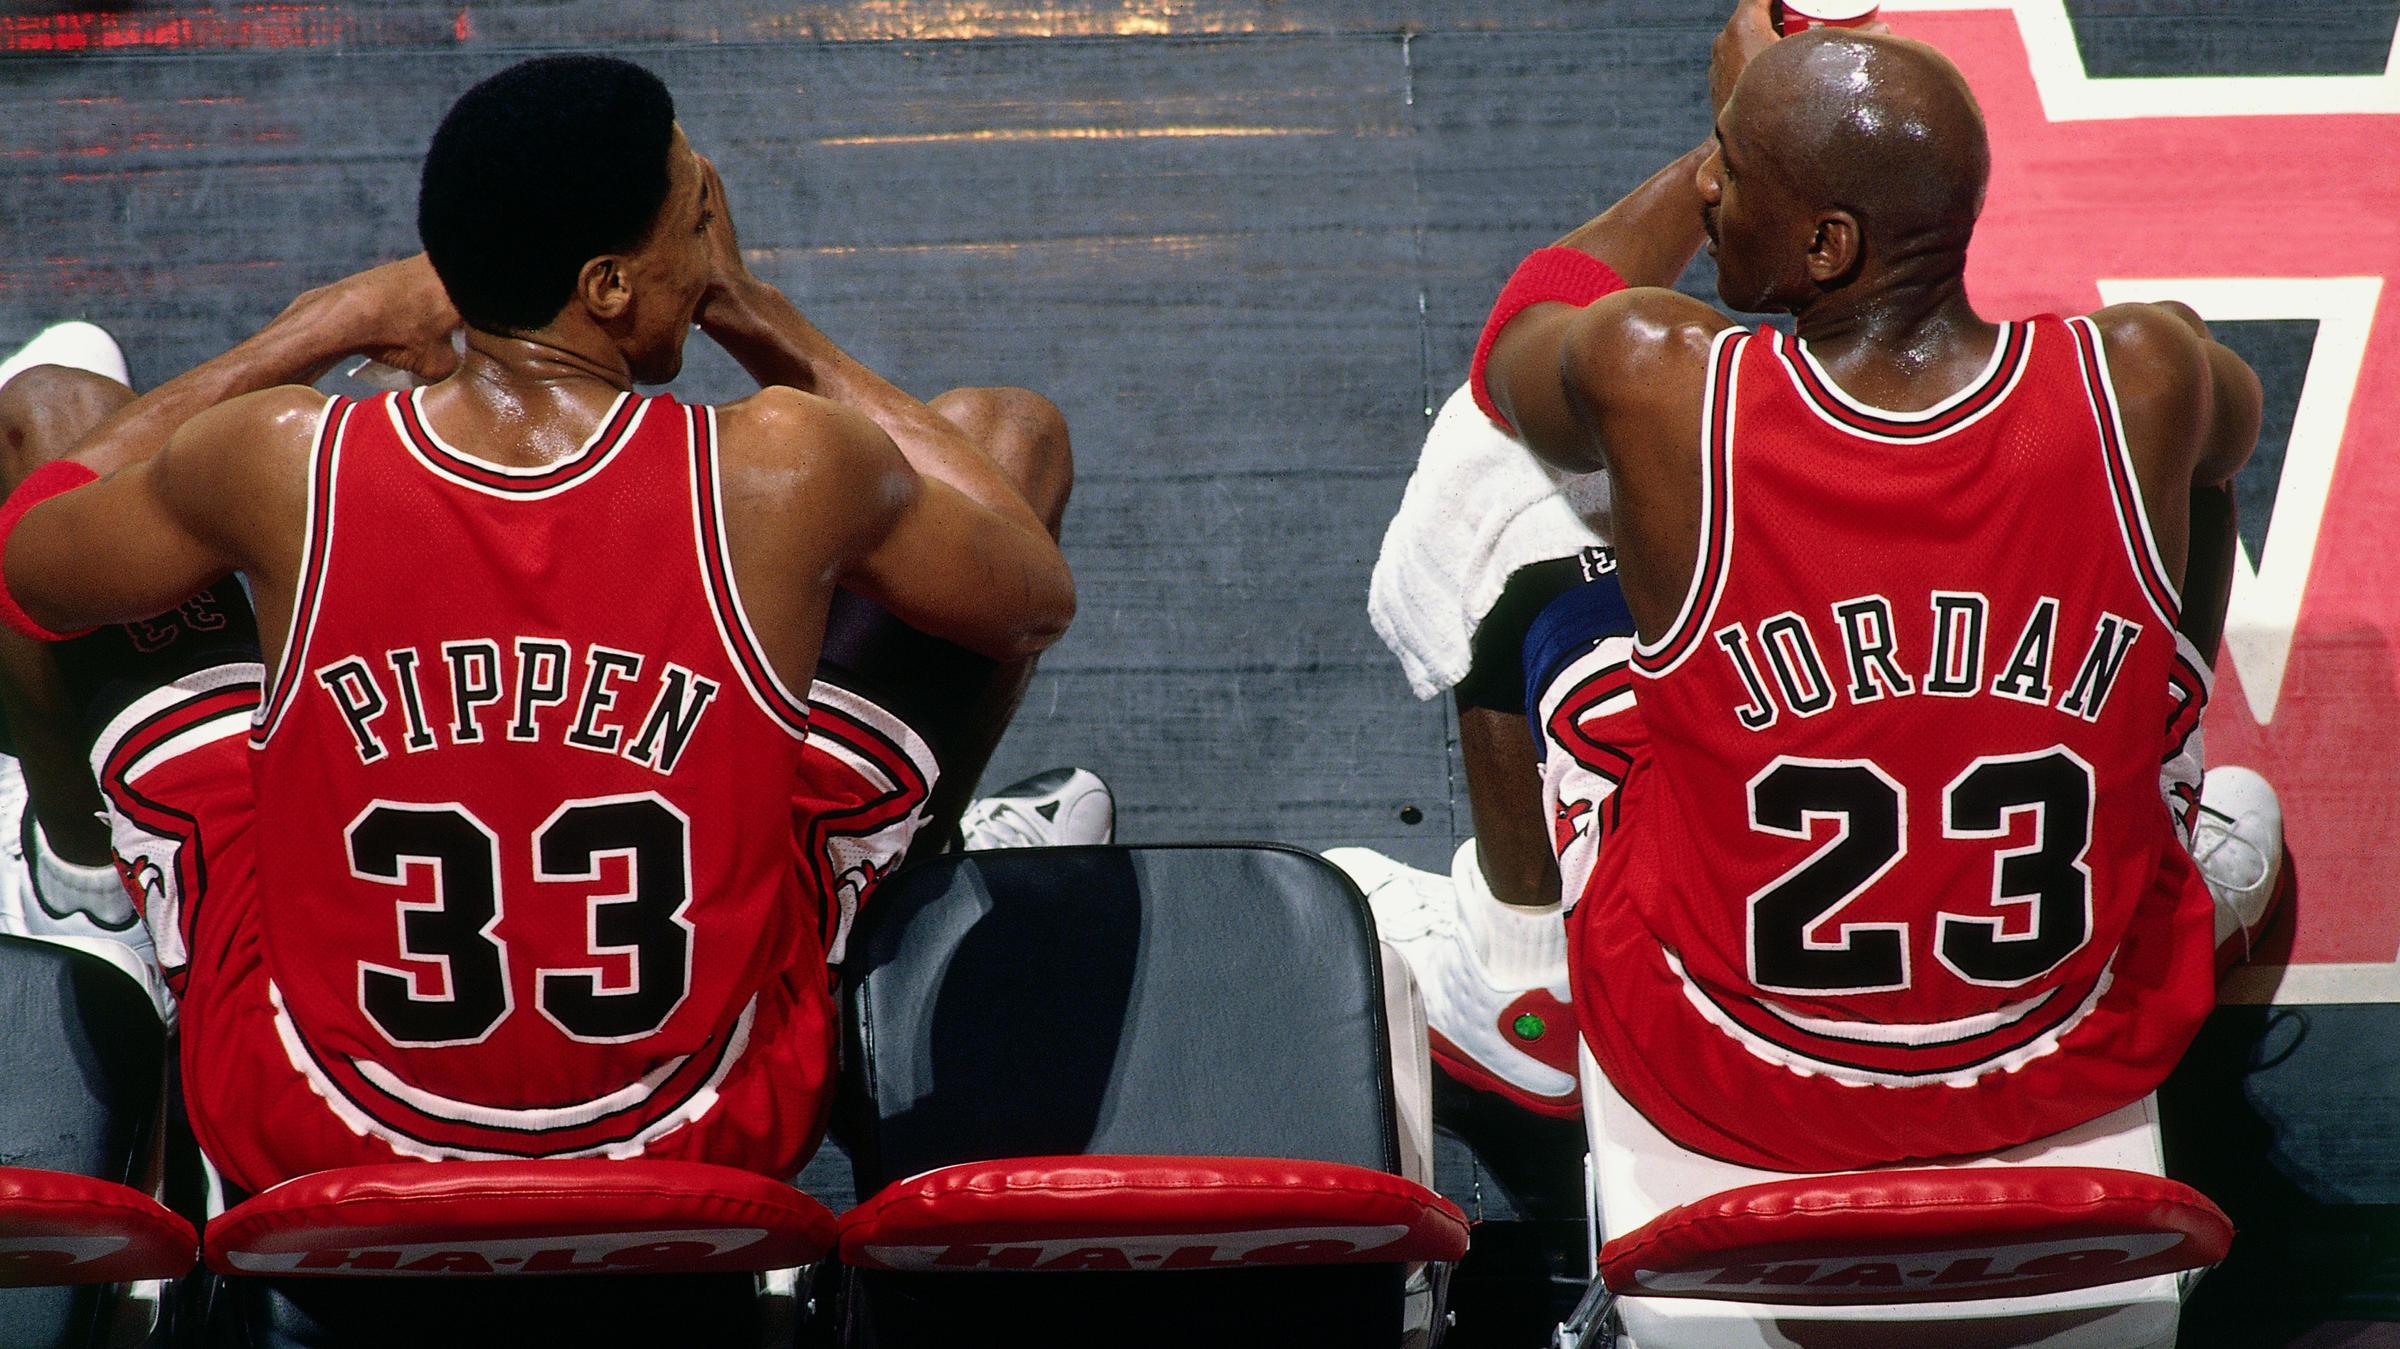 Michael Jordan And The Chicago Bulls